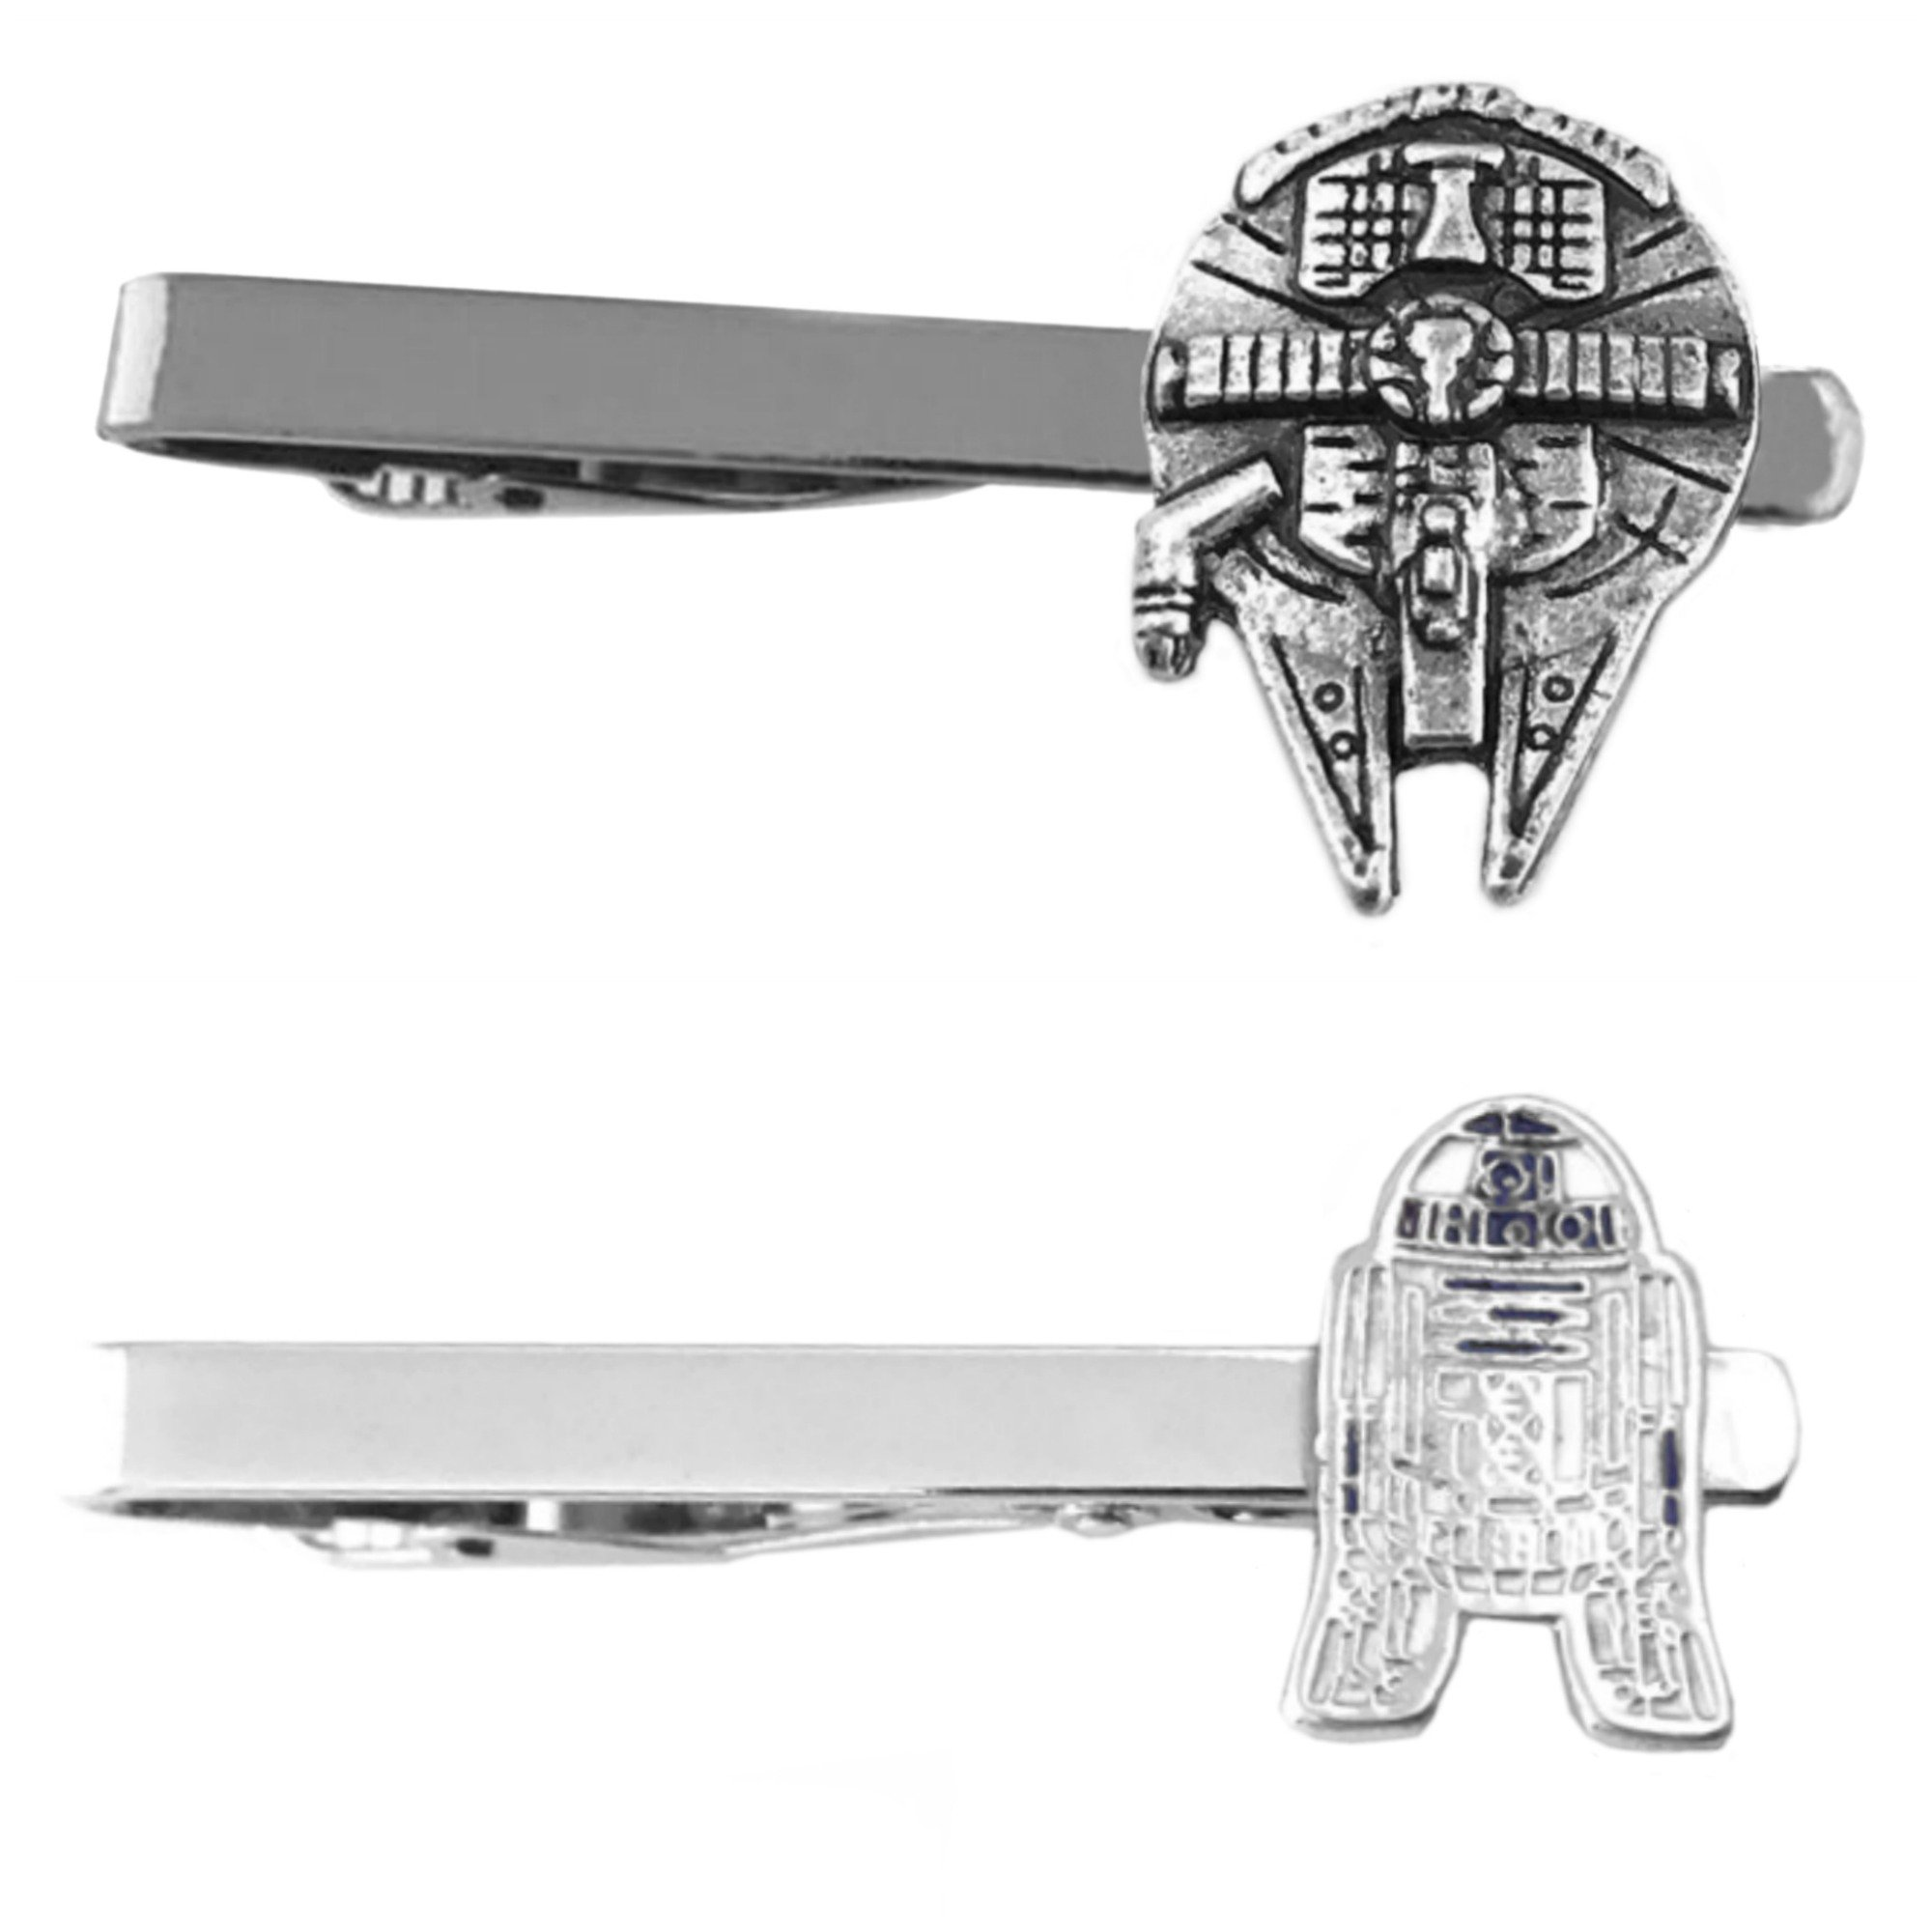 Outlander Star Wars - Millenium Falcon & R2-D2 Flat - Tiebar Tie Clasp Set of 2 Wedding Superhero Logo w/Gift Box by Outlander